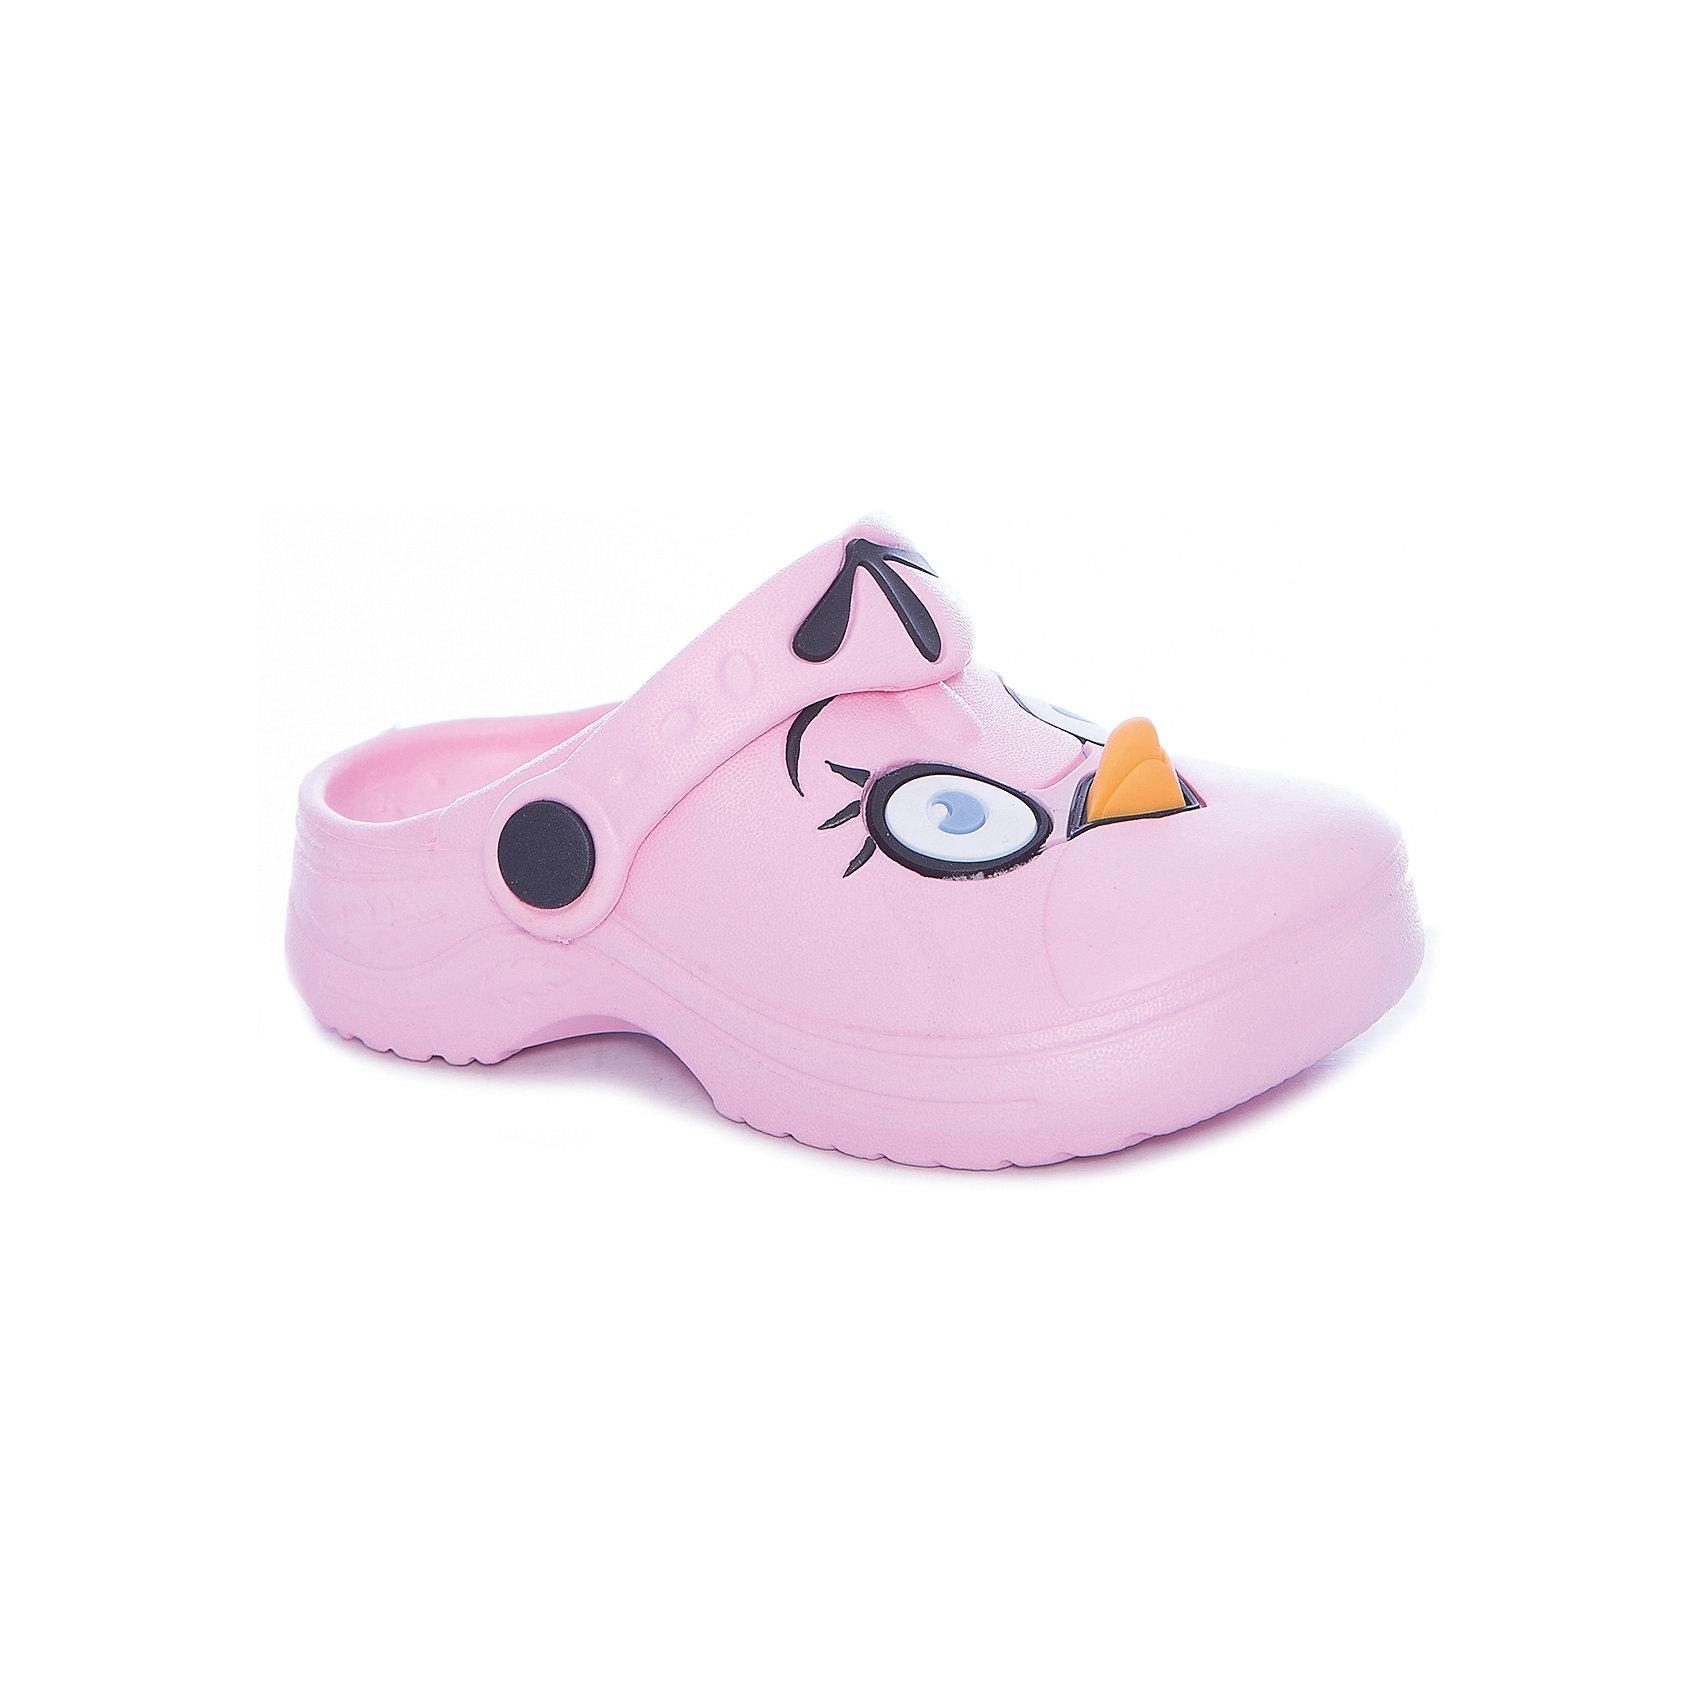 Сабо для девочки Angry Birds